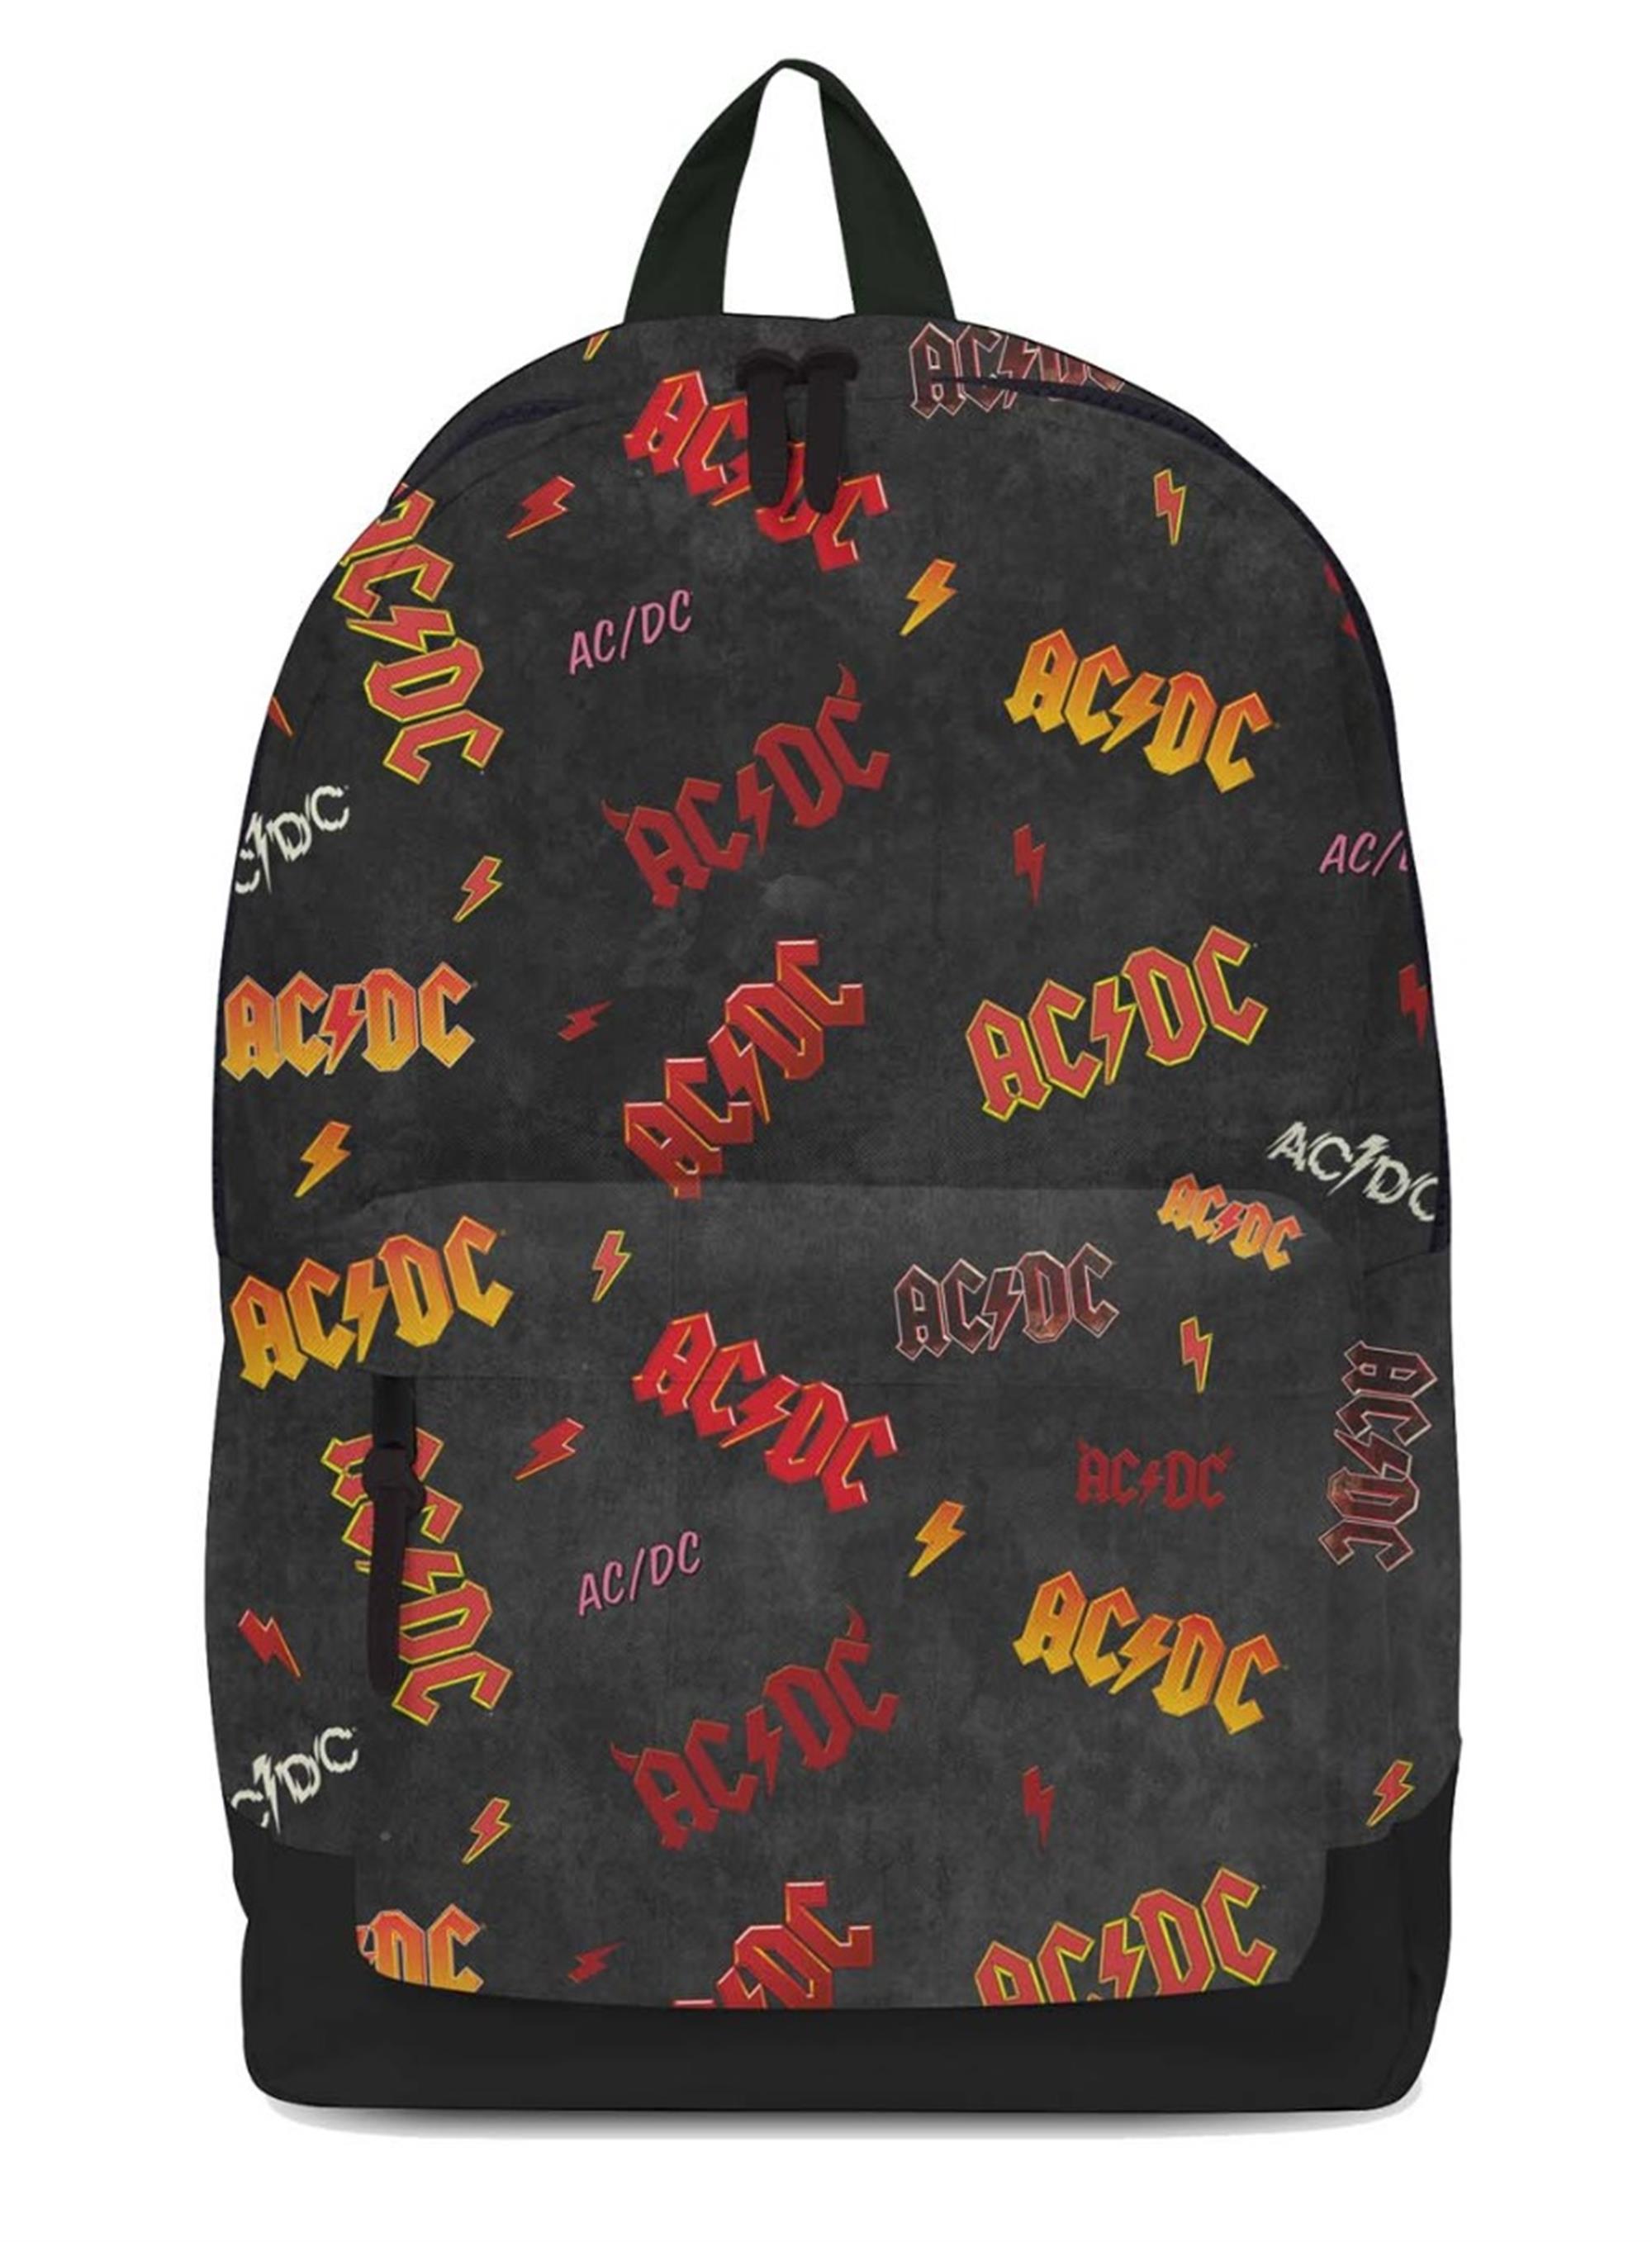 AC/DC Thunderstruck Classic Backpack